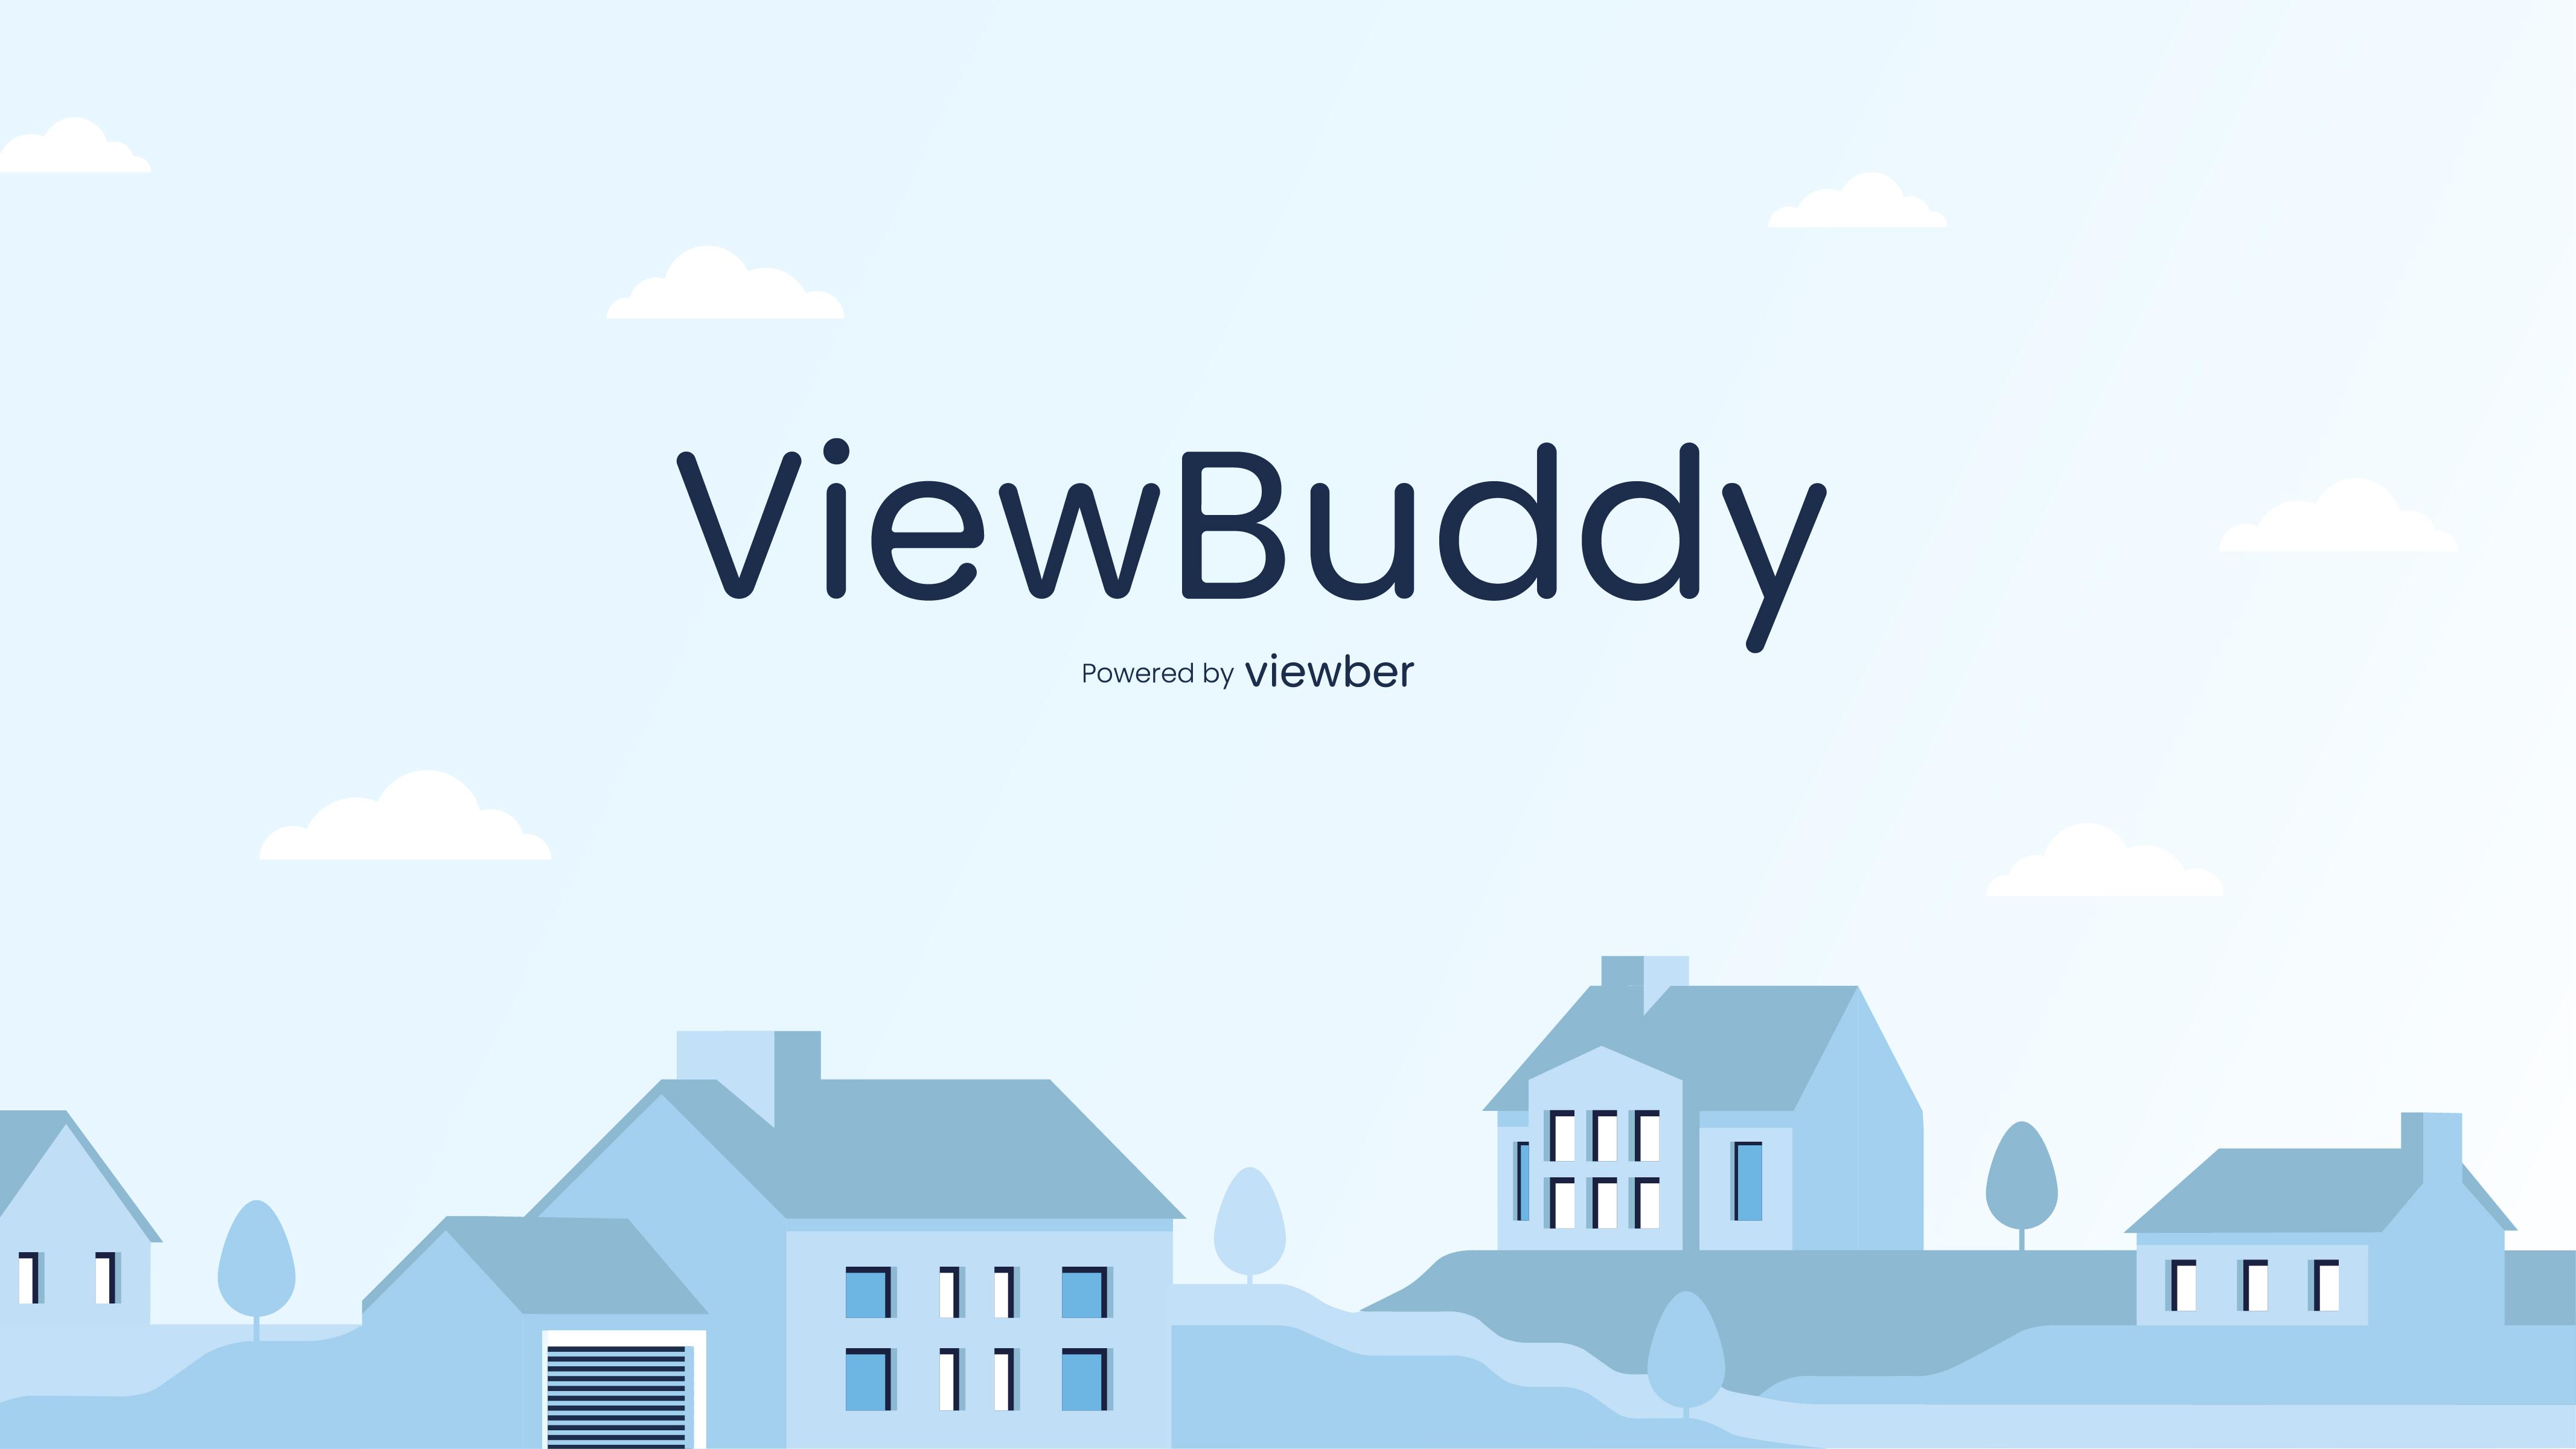 Introducing the ViewBuddy App